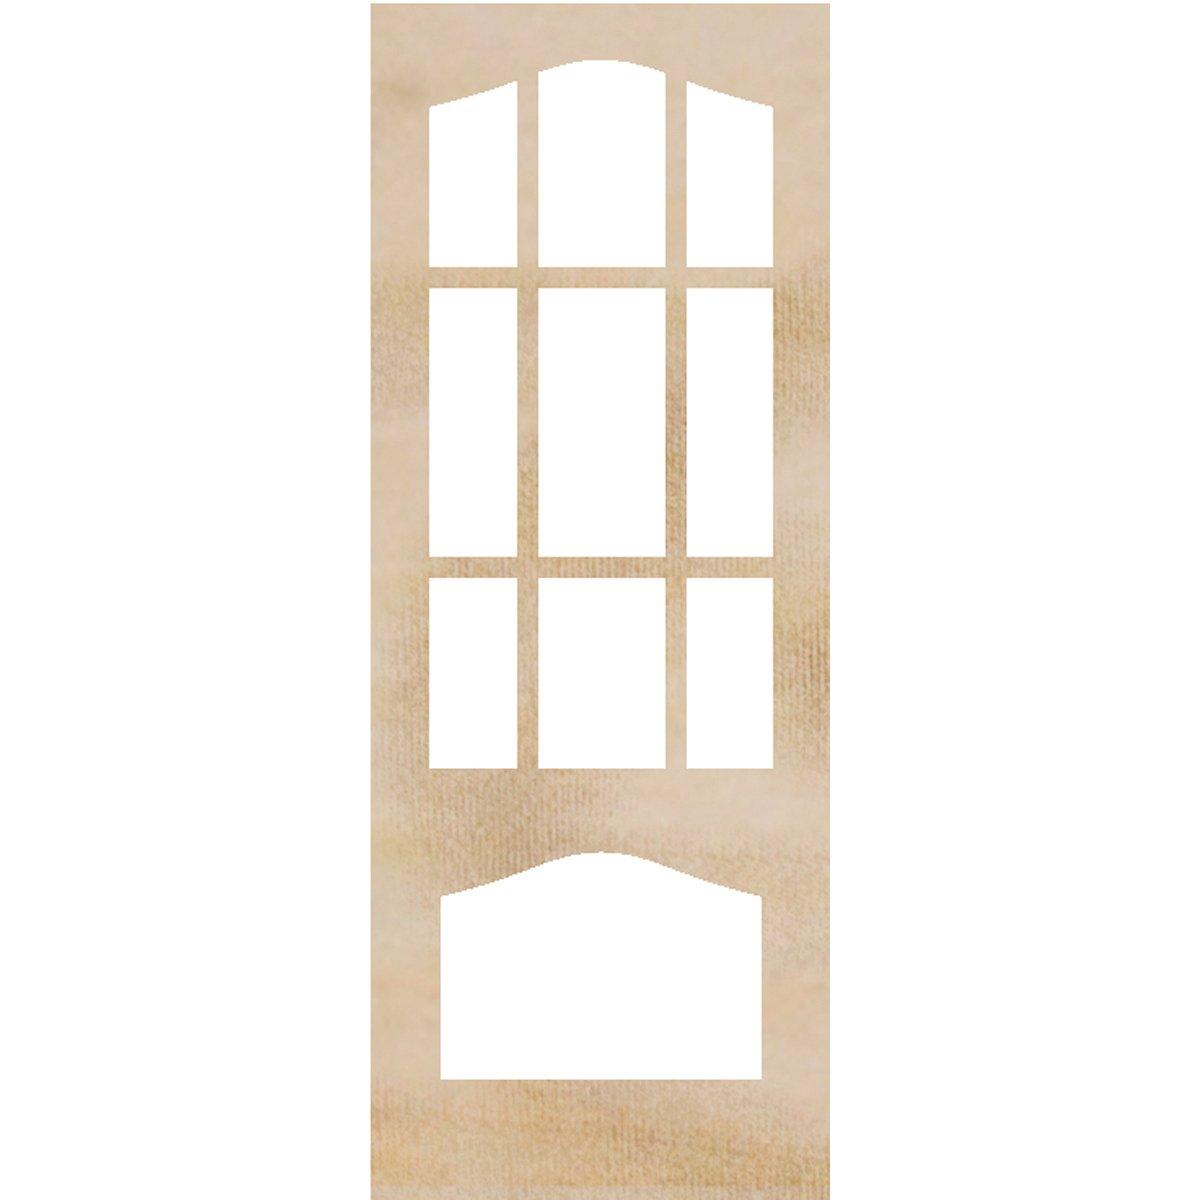 Kaisercraft Wood Flourishes 2/Pack-Decorative Door Frames, 4 x 10.25-Inch